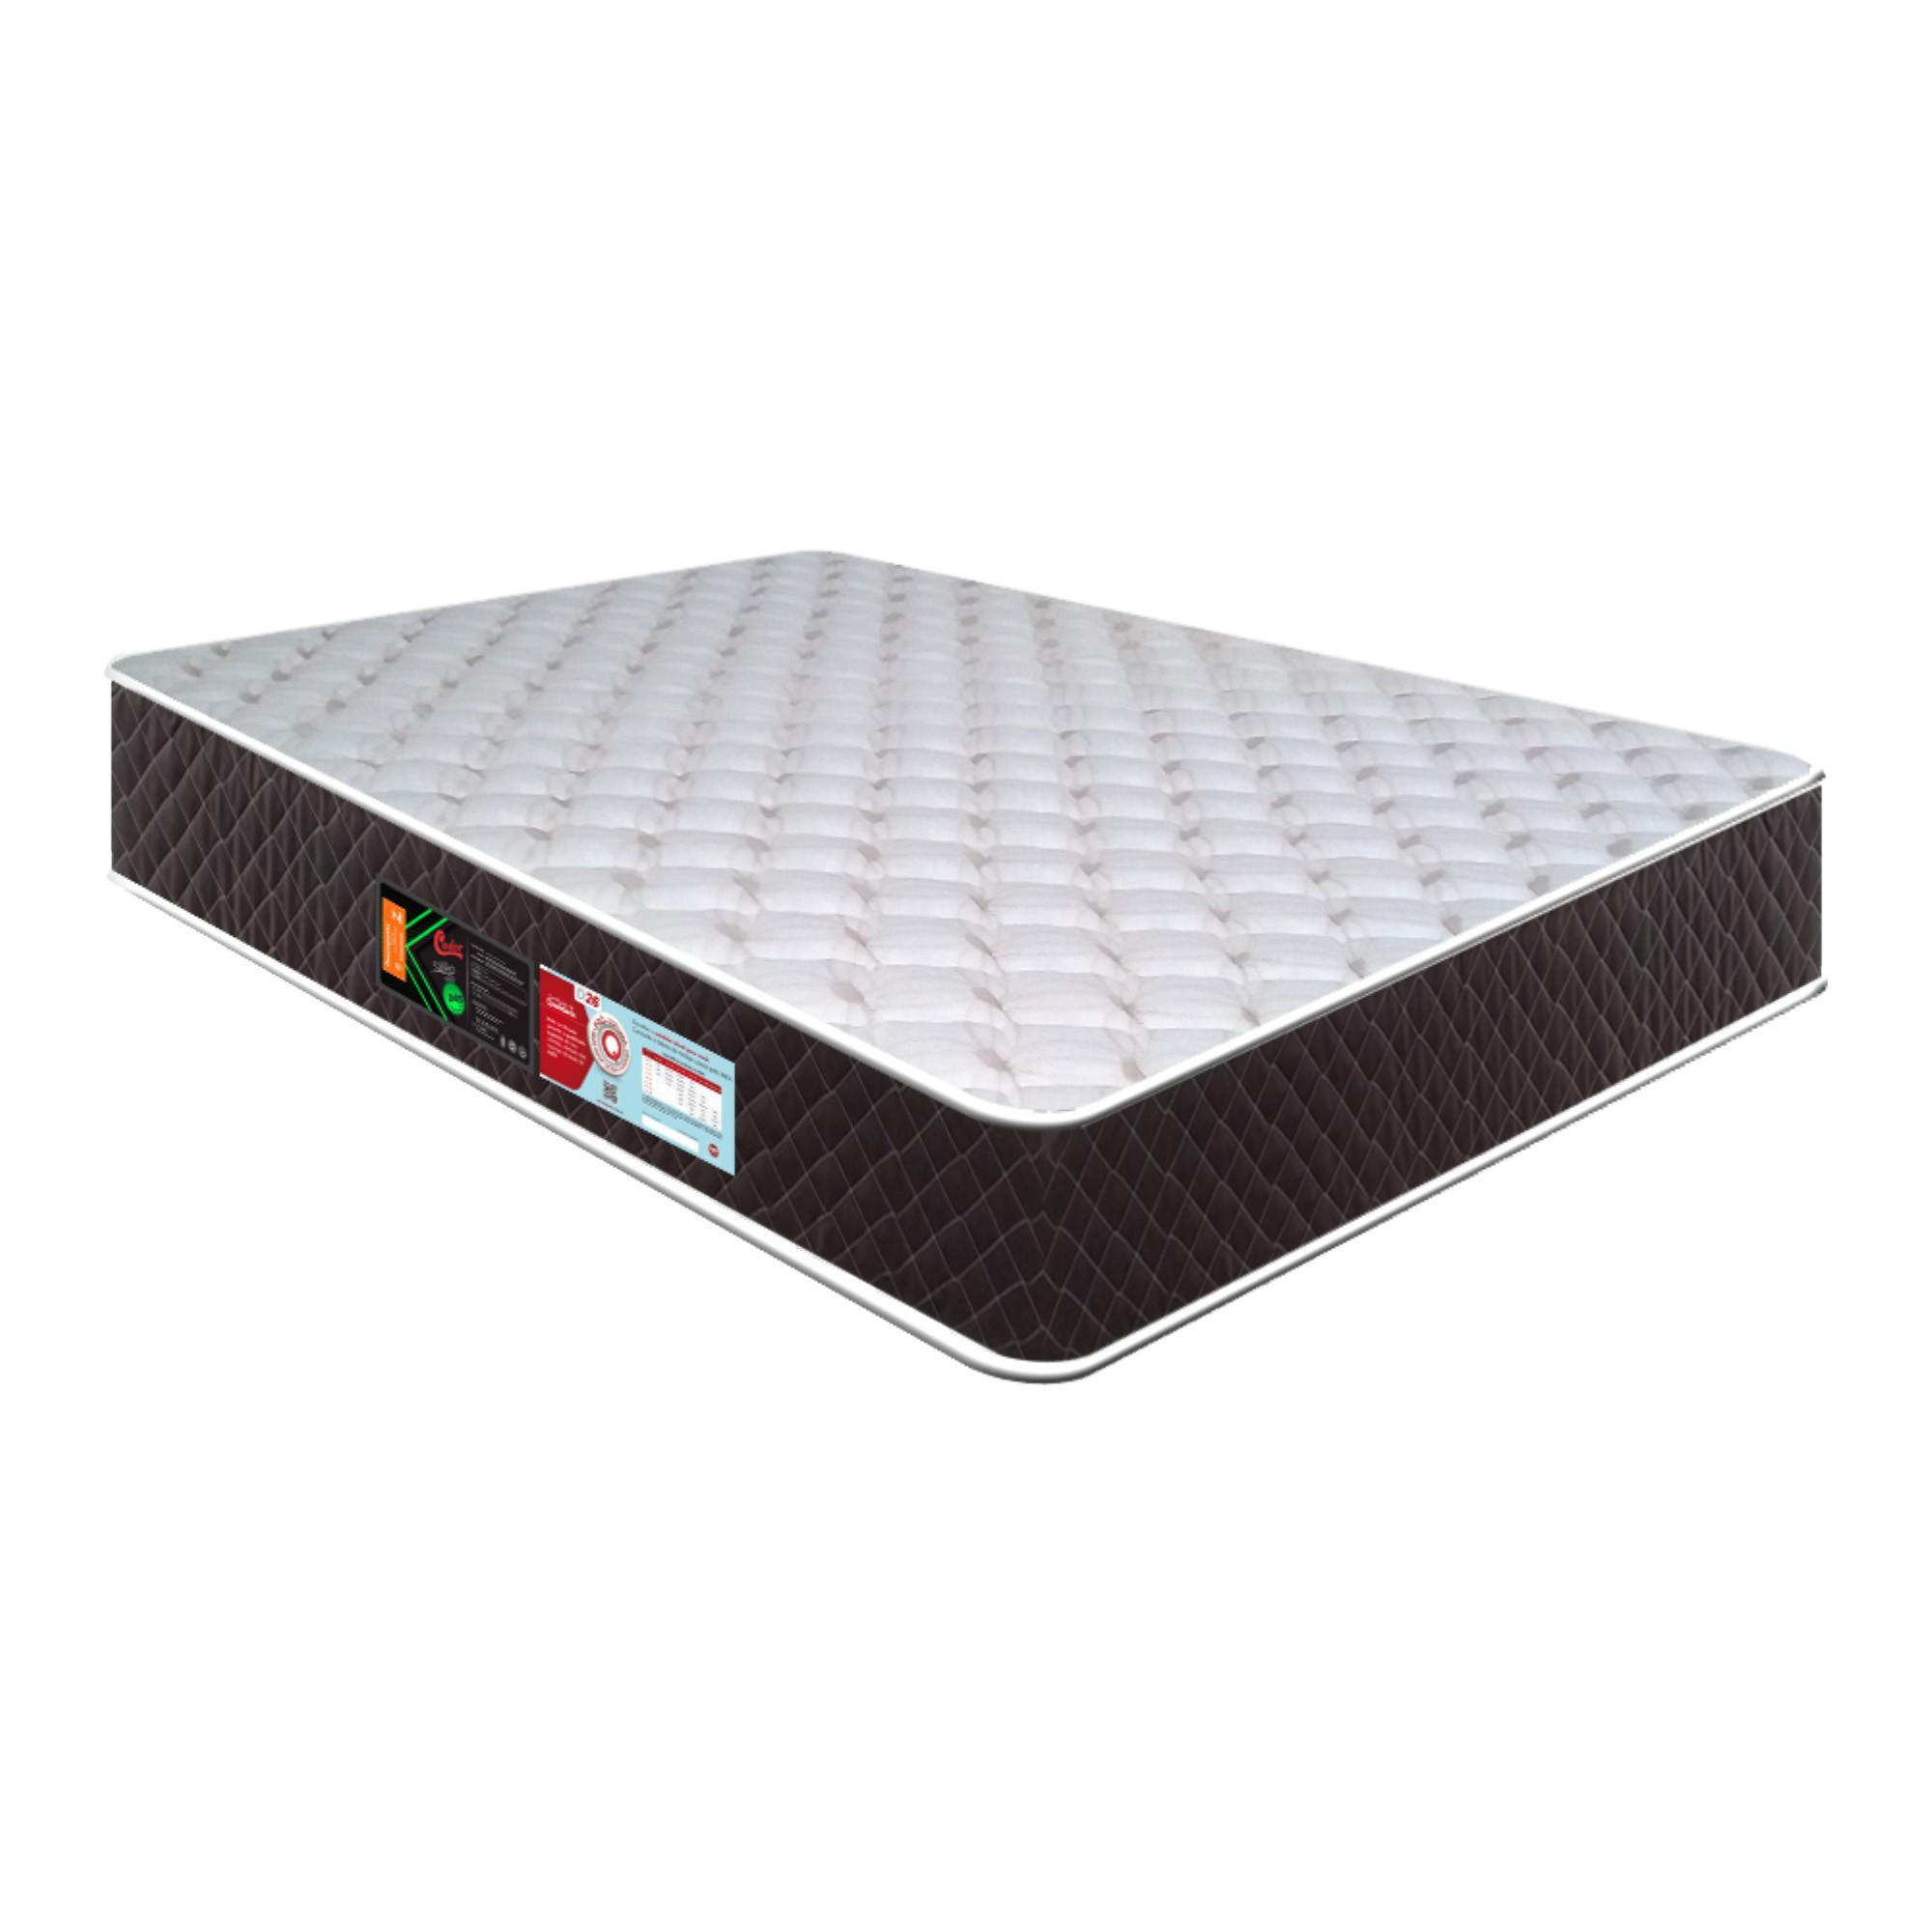 Colchão Castor Sleep Max D28 25 cm [Casal 138 x 188 cm]